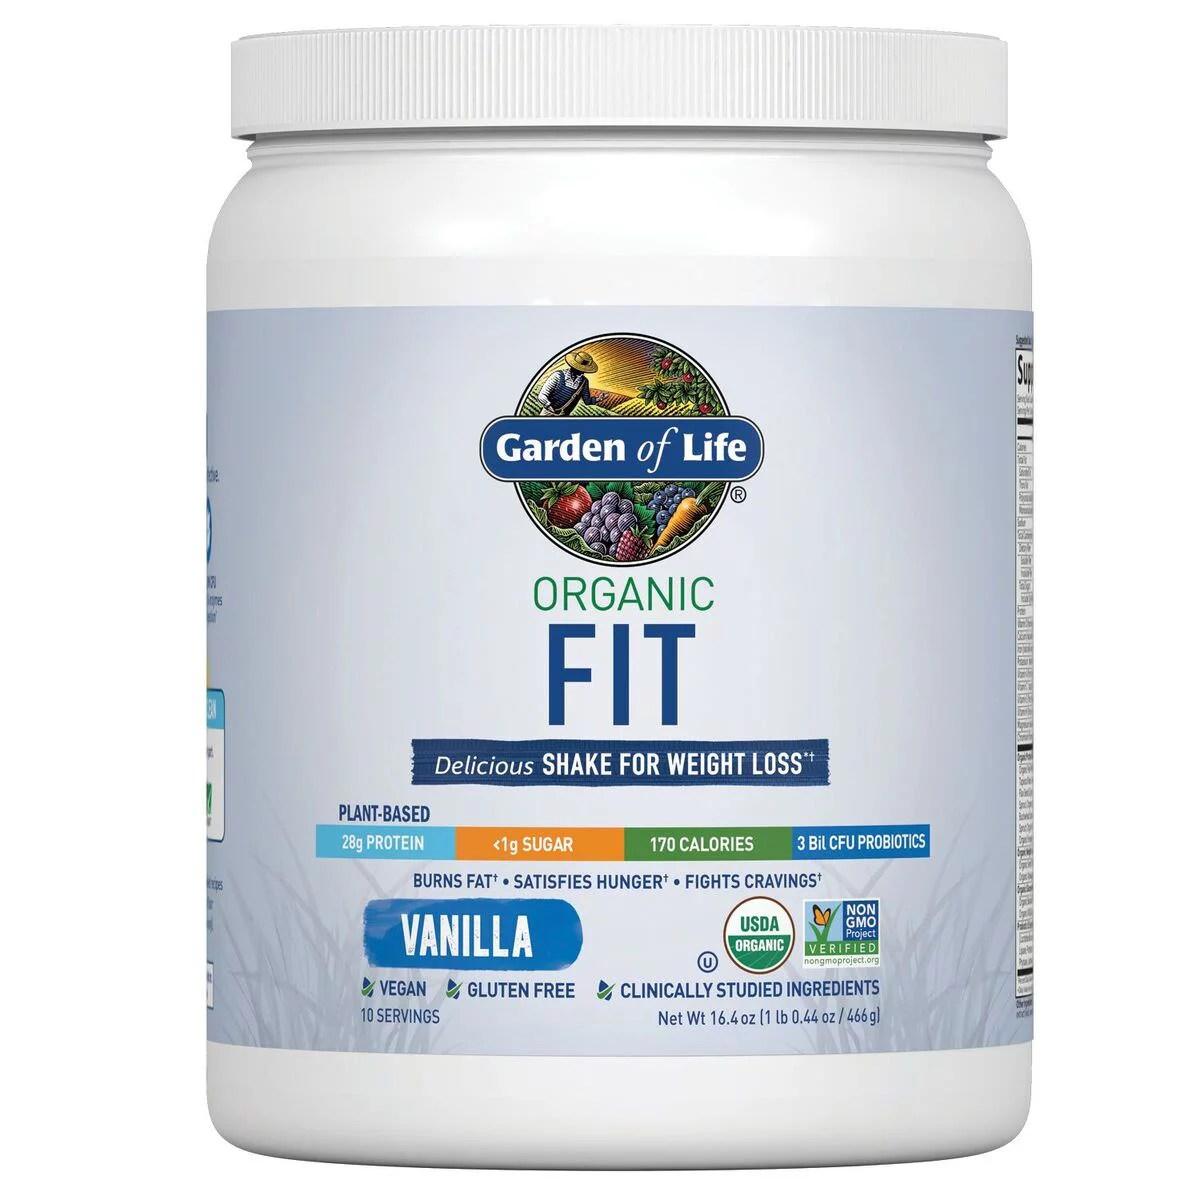 Garden of Life Organic Fit Protein Powder Vanilla 28g ...